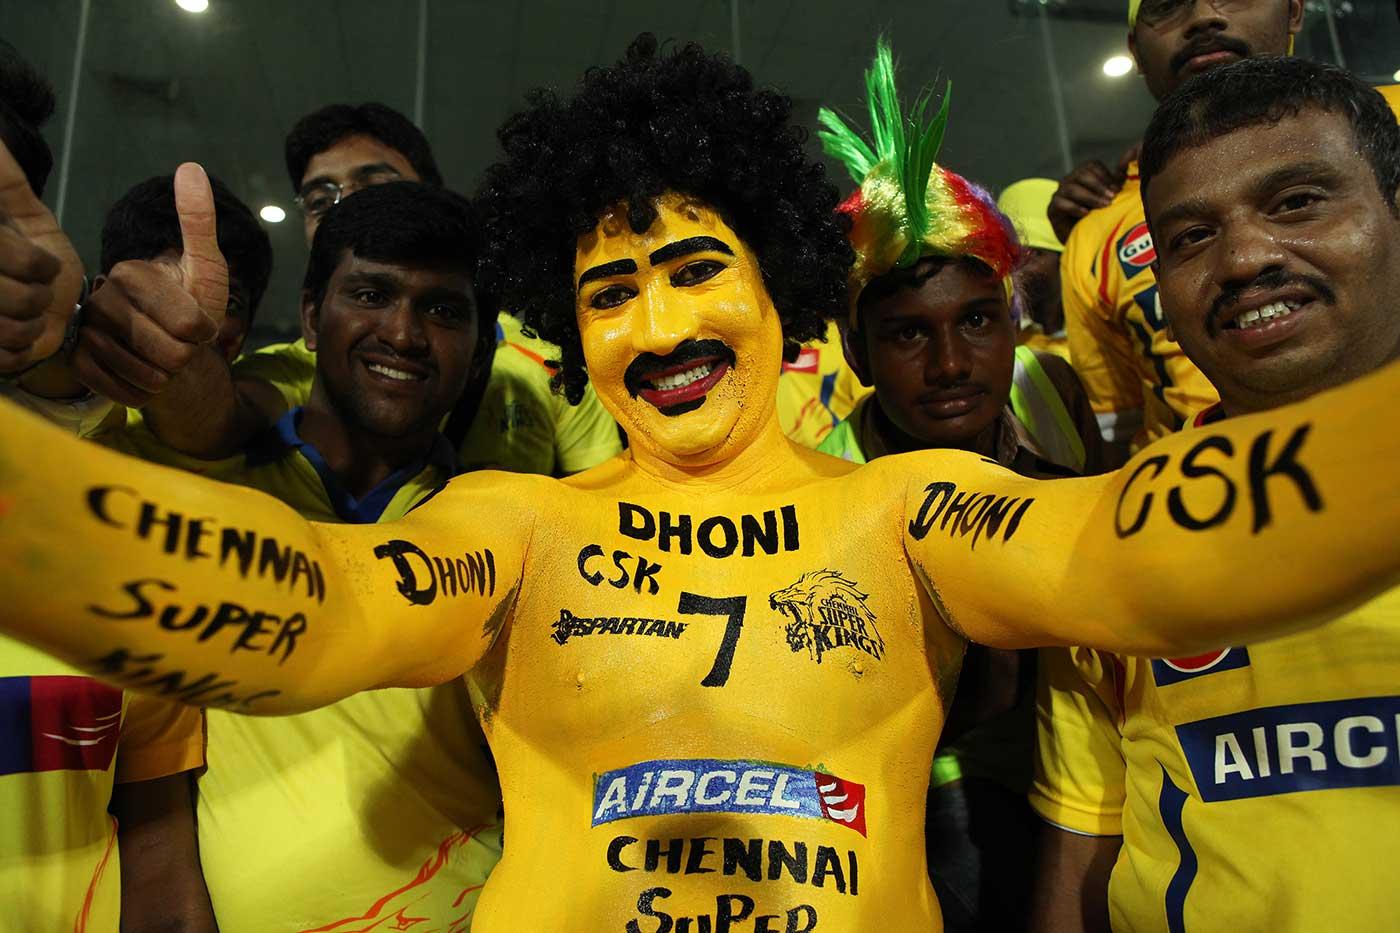 CSK supporter extraordinaire Saravanan: lives in a yellow submarine